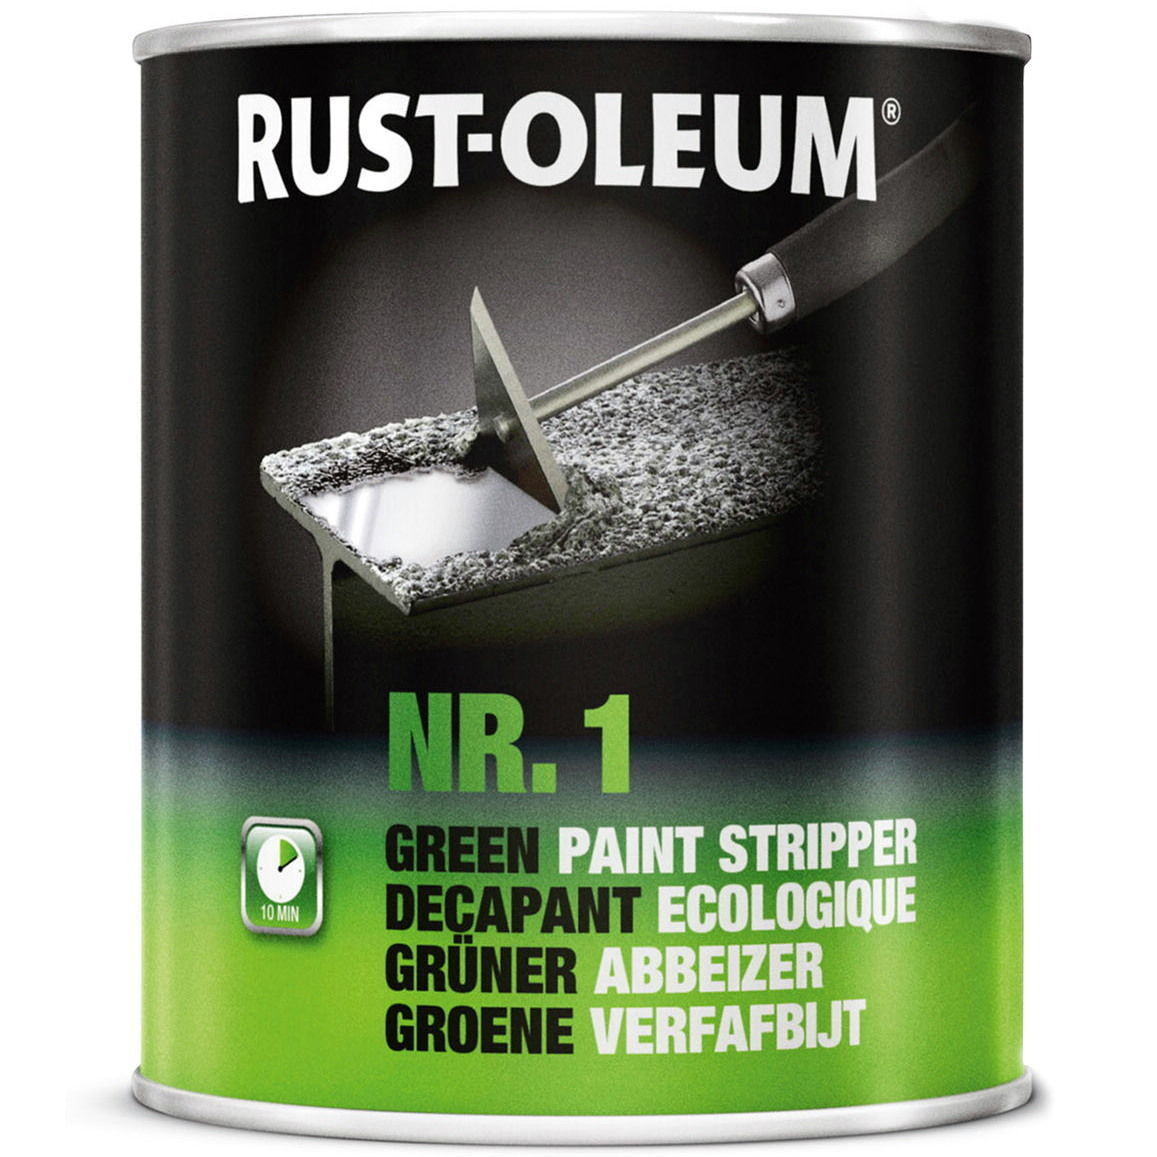 2.5L Rust-Oleum Nr.1 Grün Paint Stripper In Minutes Removes Glue 99% Bio